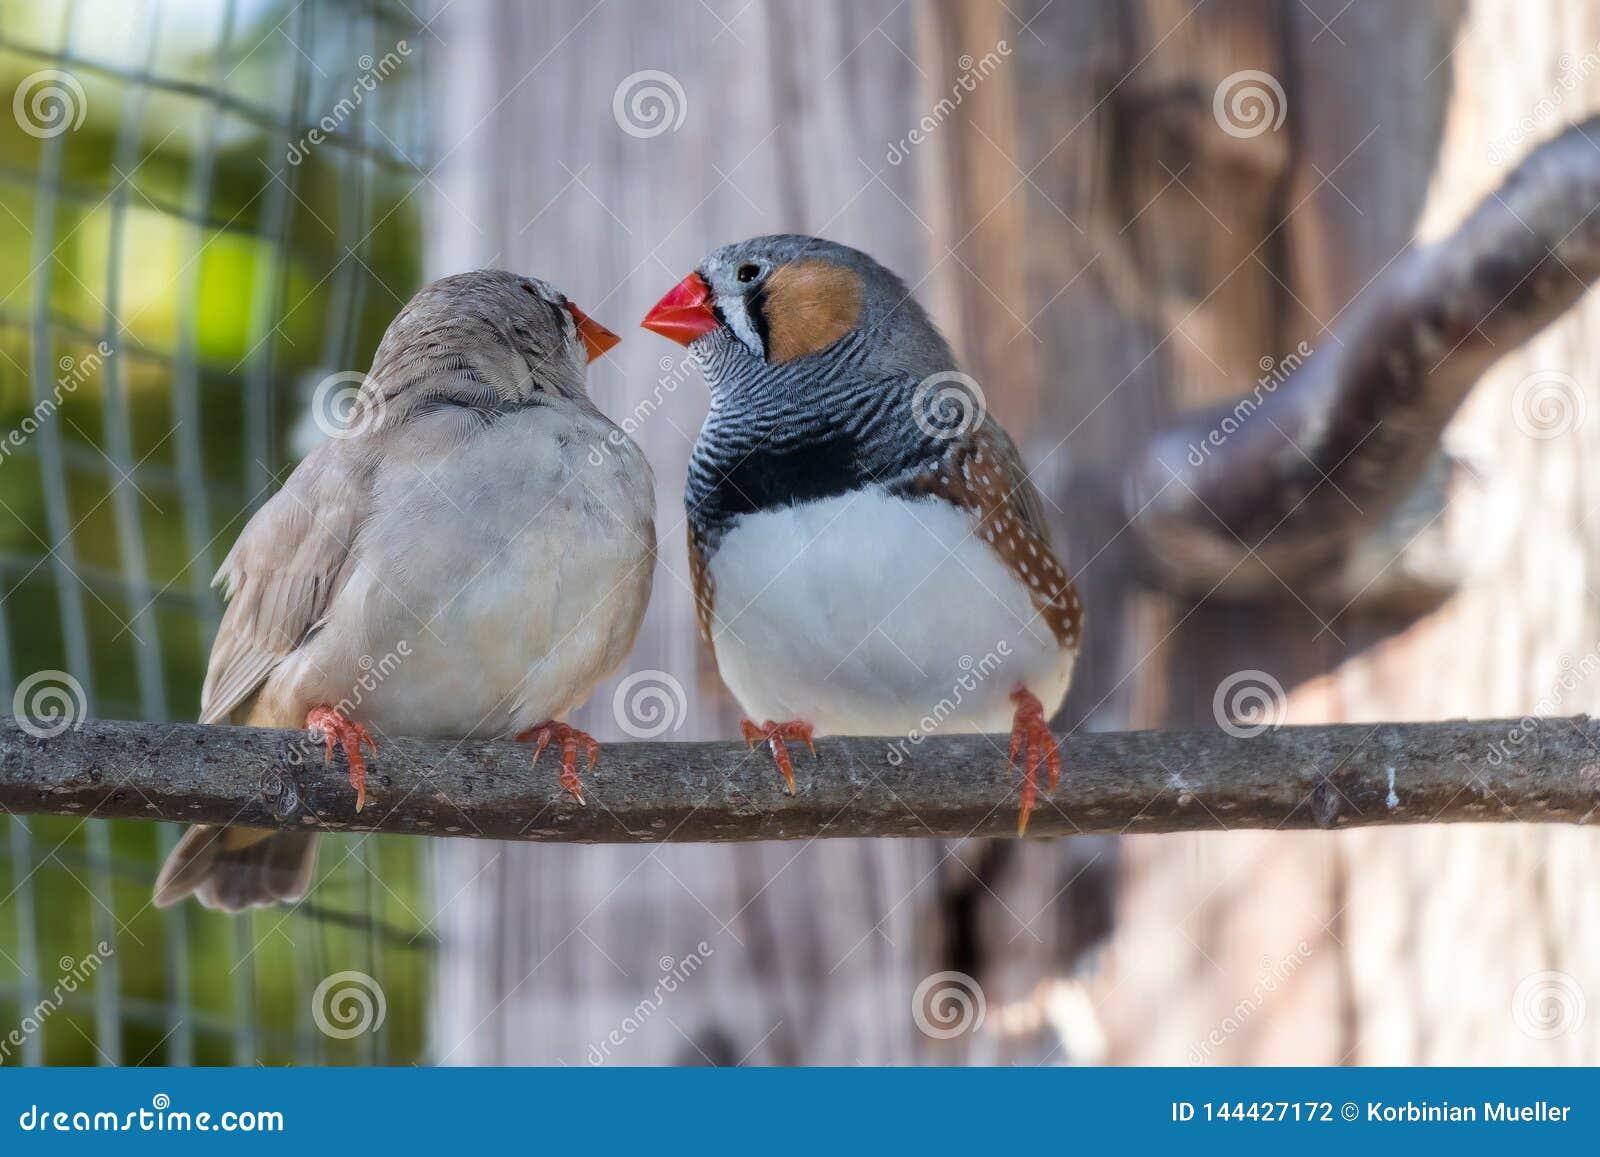 Amore fra 2 uccelli